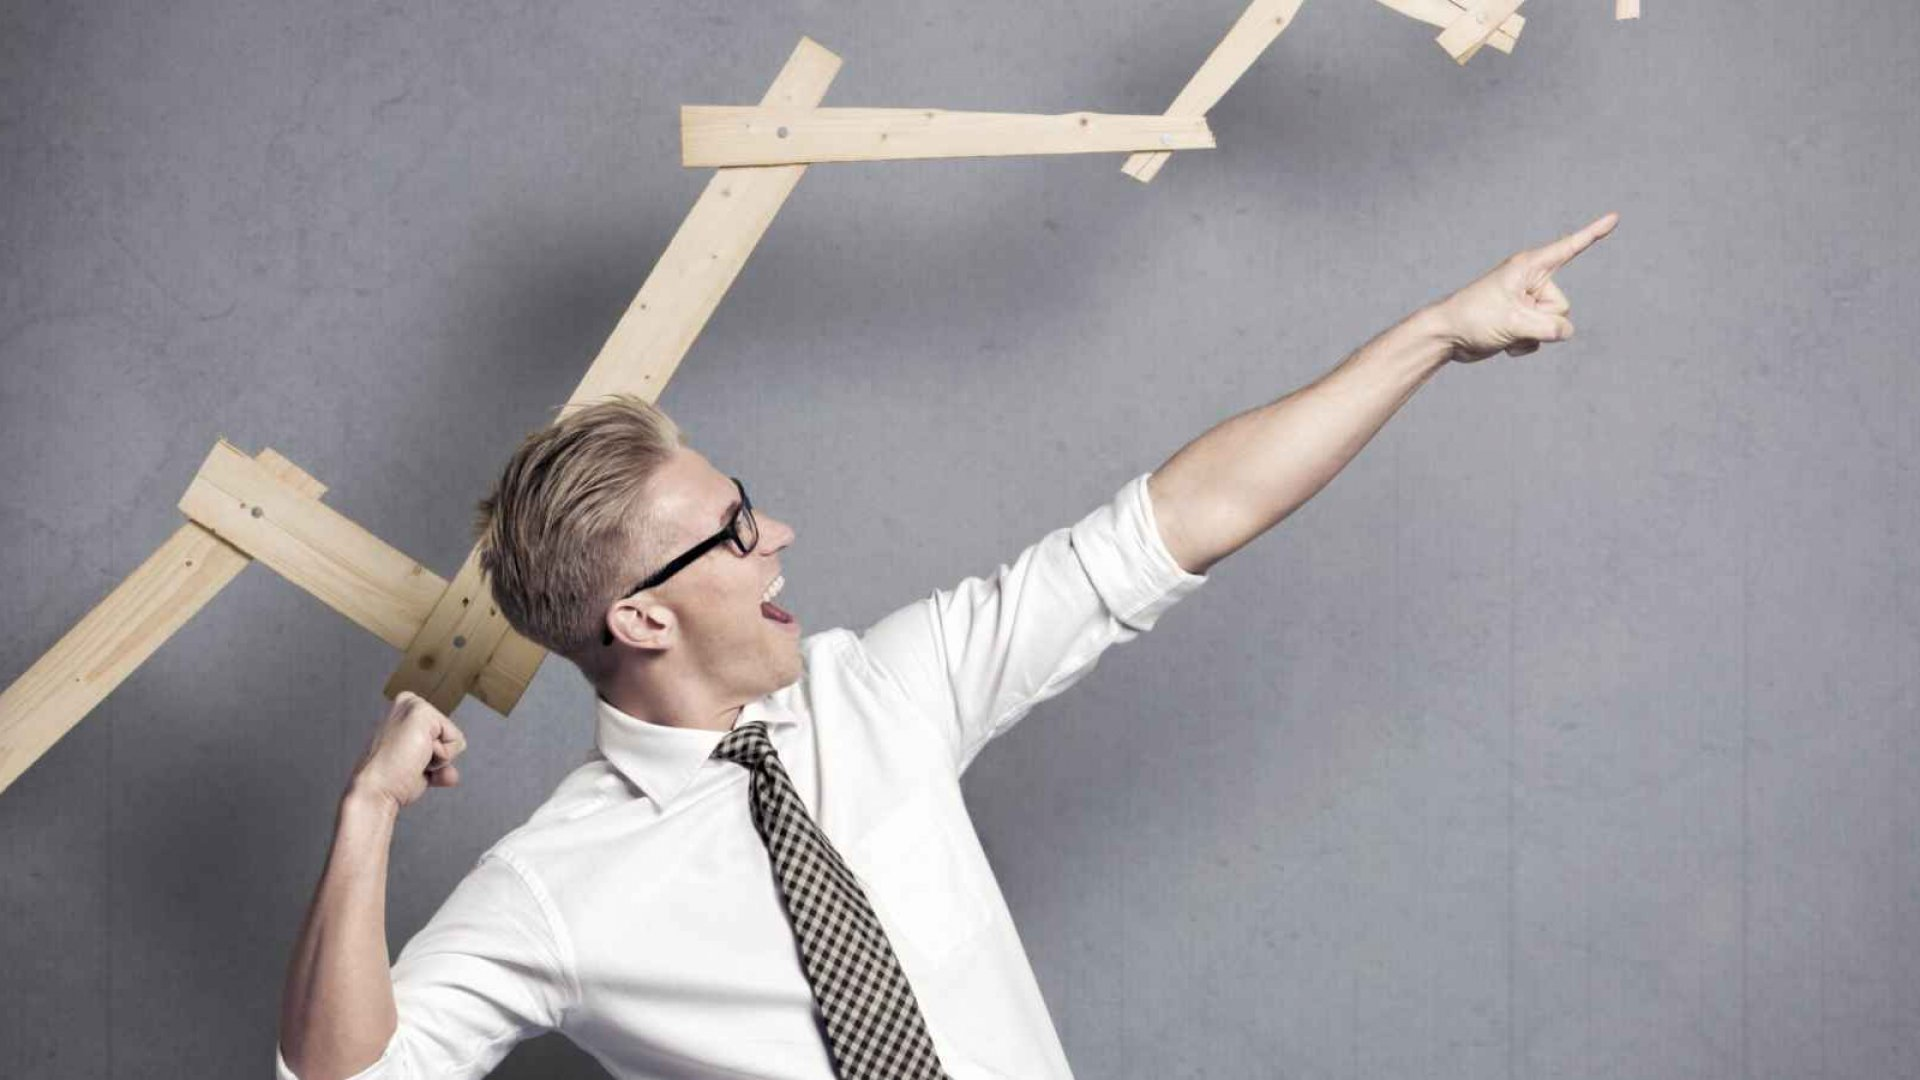 5 Uncommon Skills Every Entrepreneur Needs to Win Big